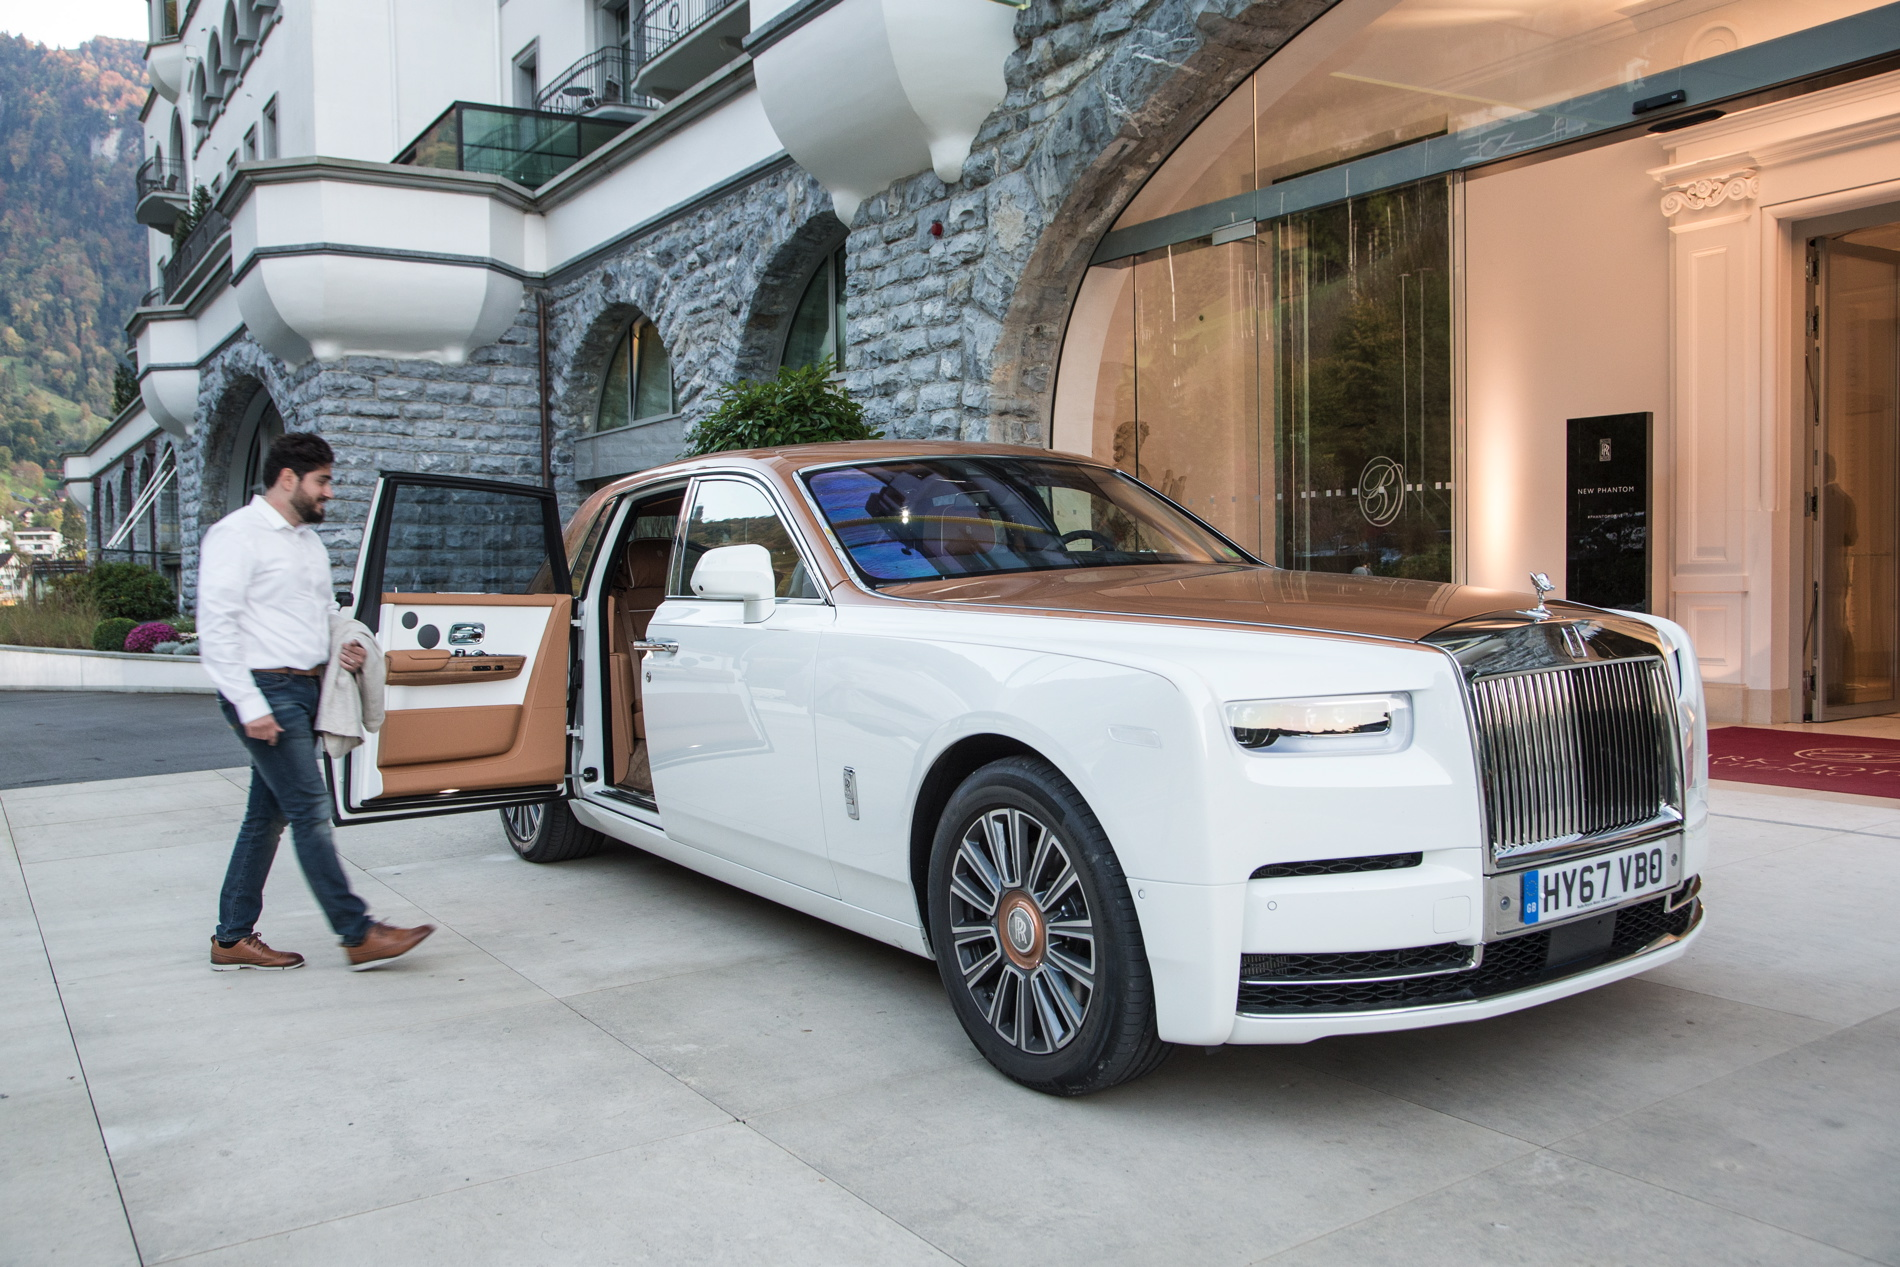 Rolls Royce Phantom Best Luxury Cars: Rolls-Royce Phantom VIII Wins Luxury Car Of The Year Award